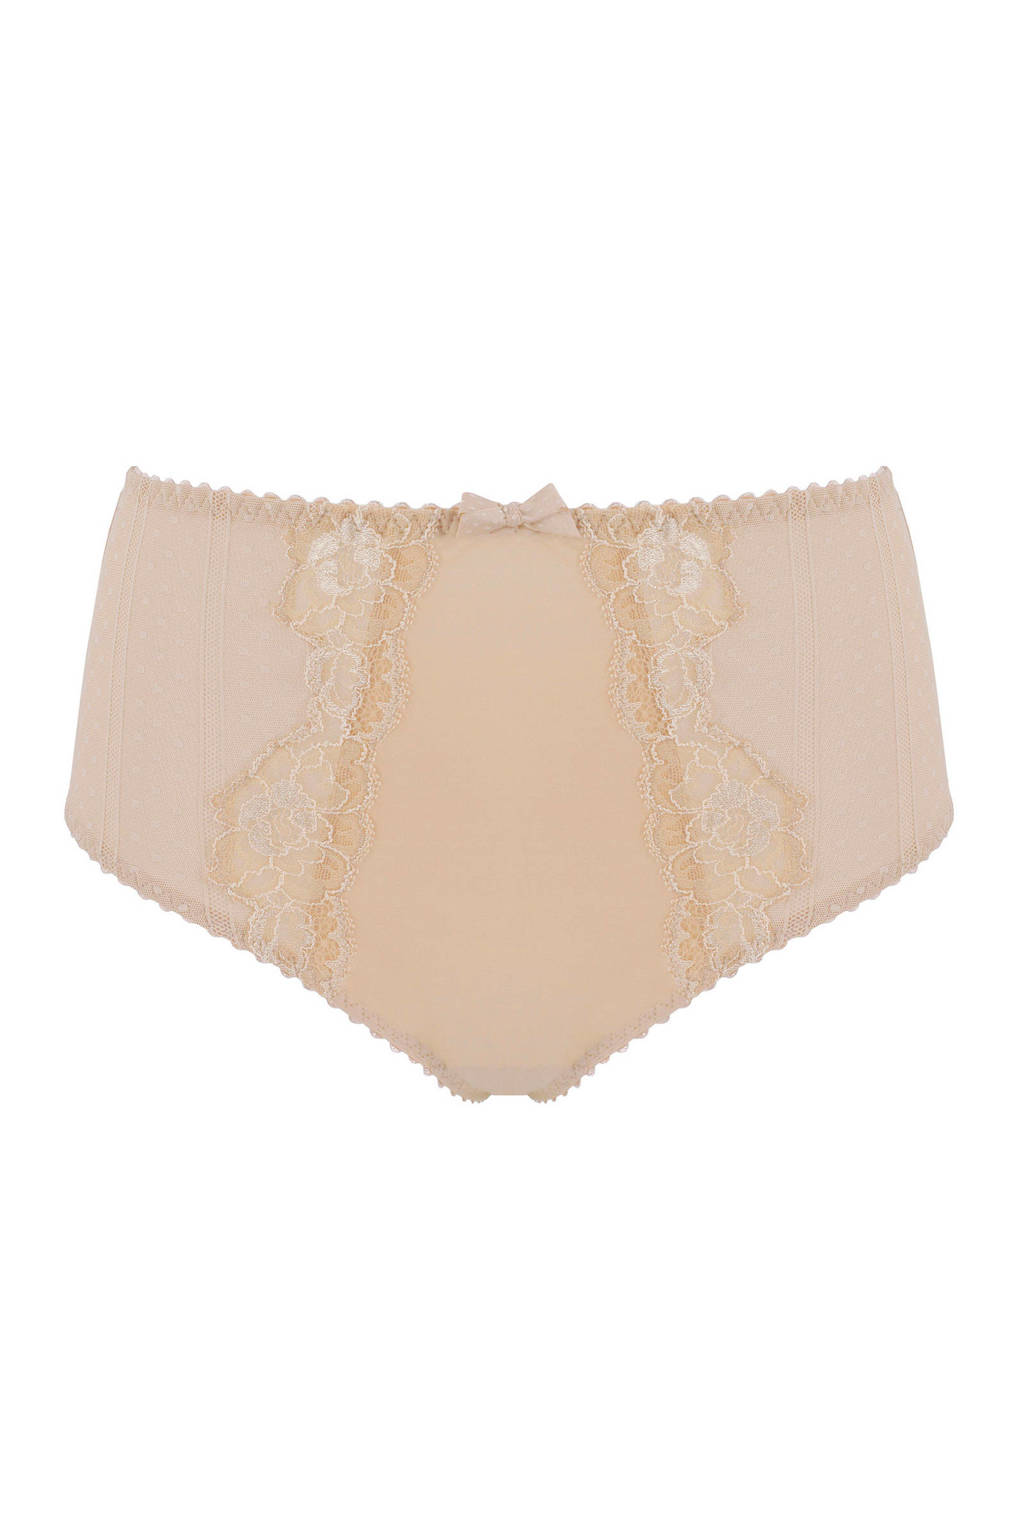 PrimaDonna maxislip Couture Taille beige, Beige